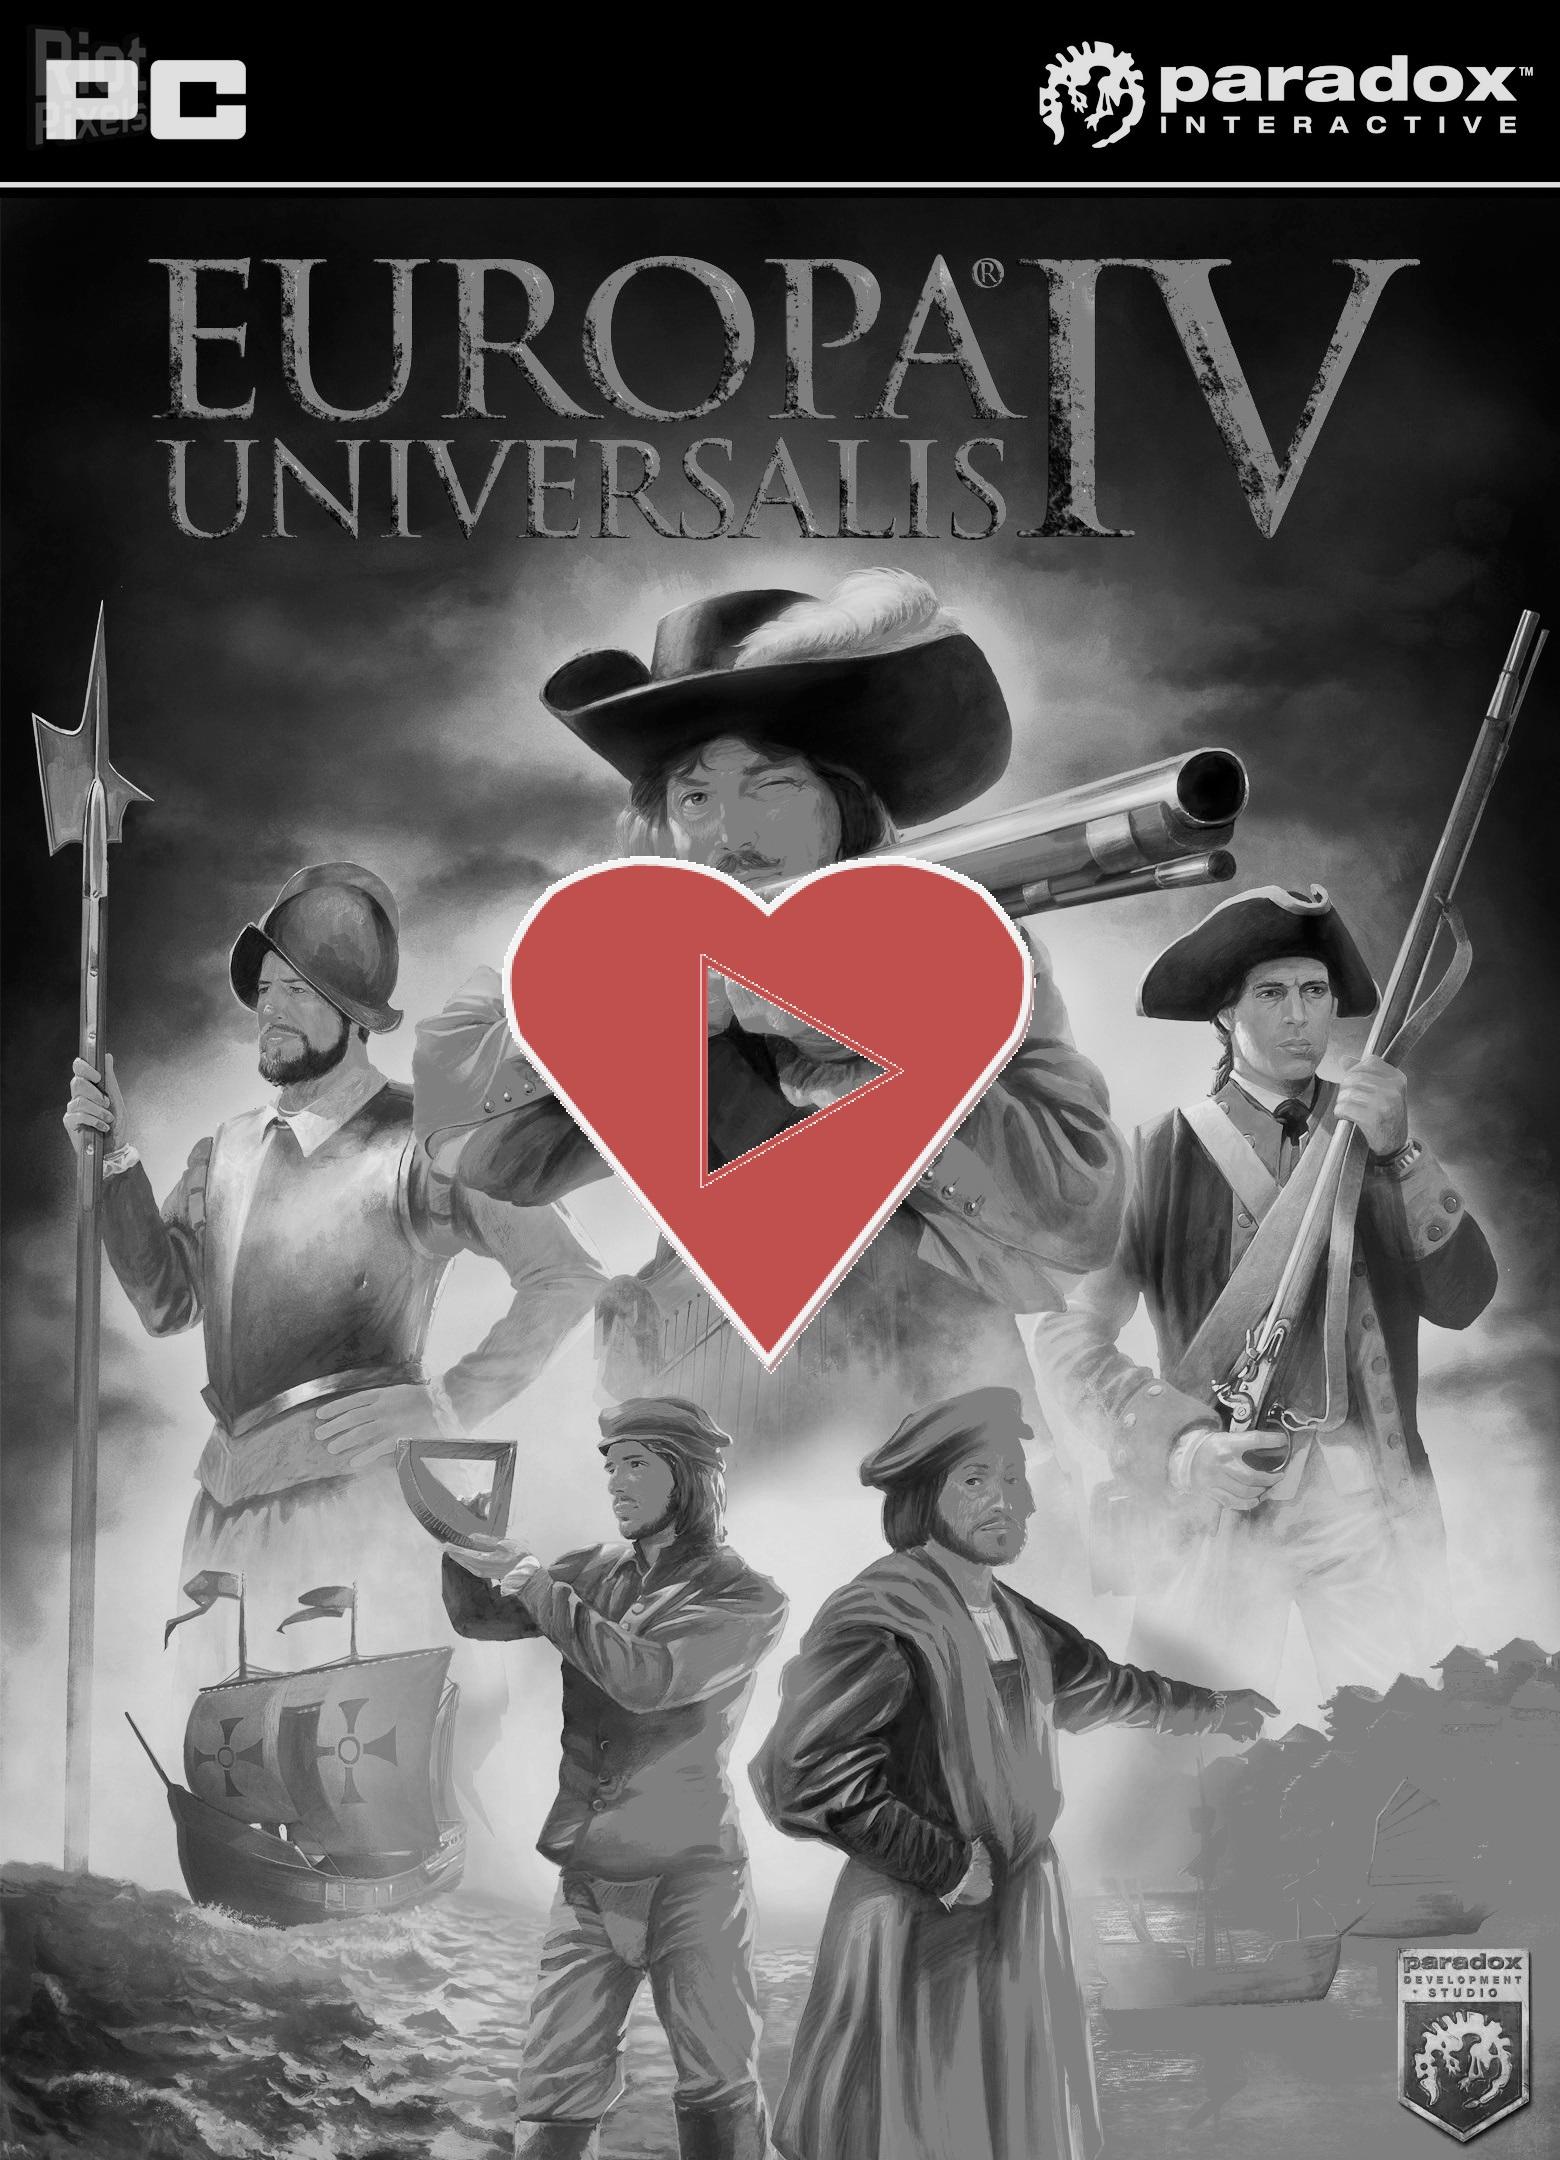 [Playthrough] Europa Universalis IV – Part I